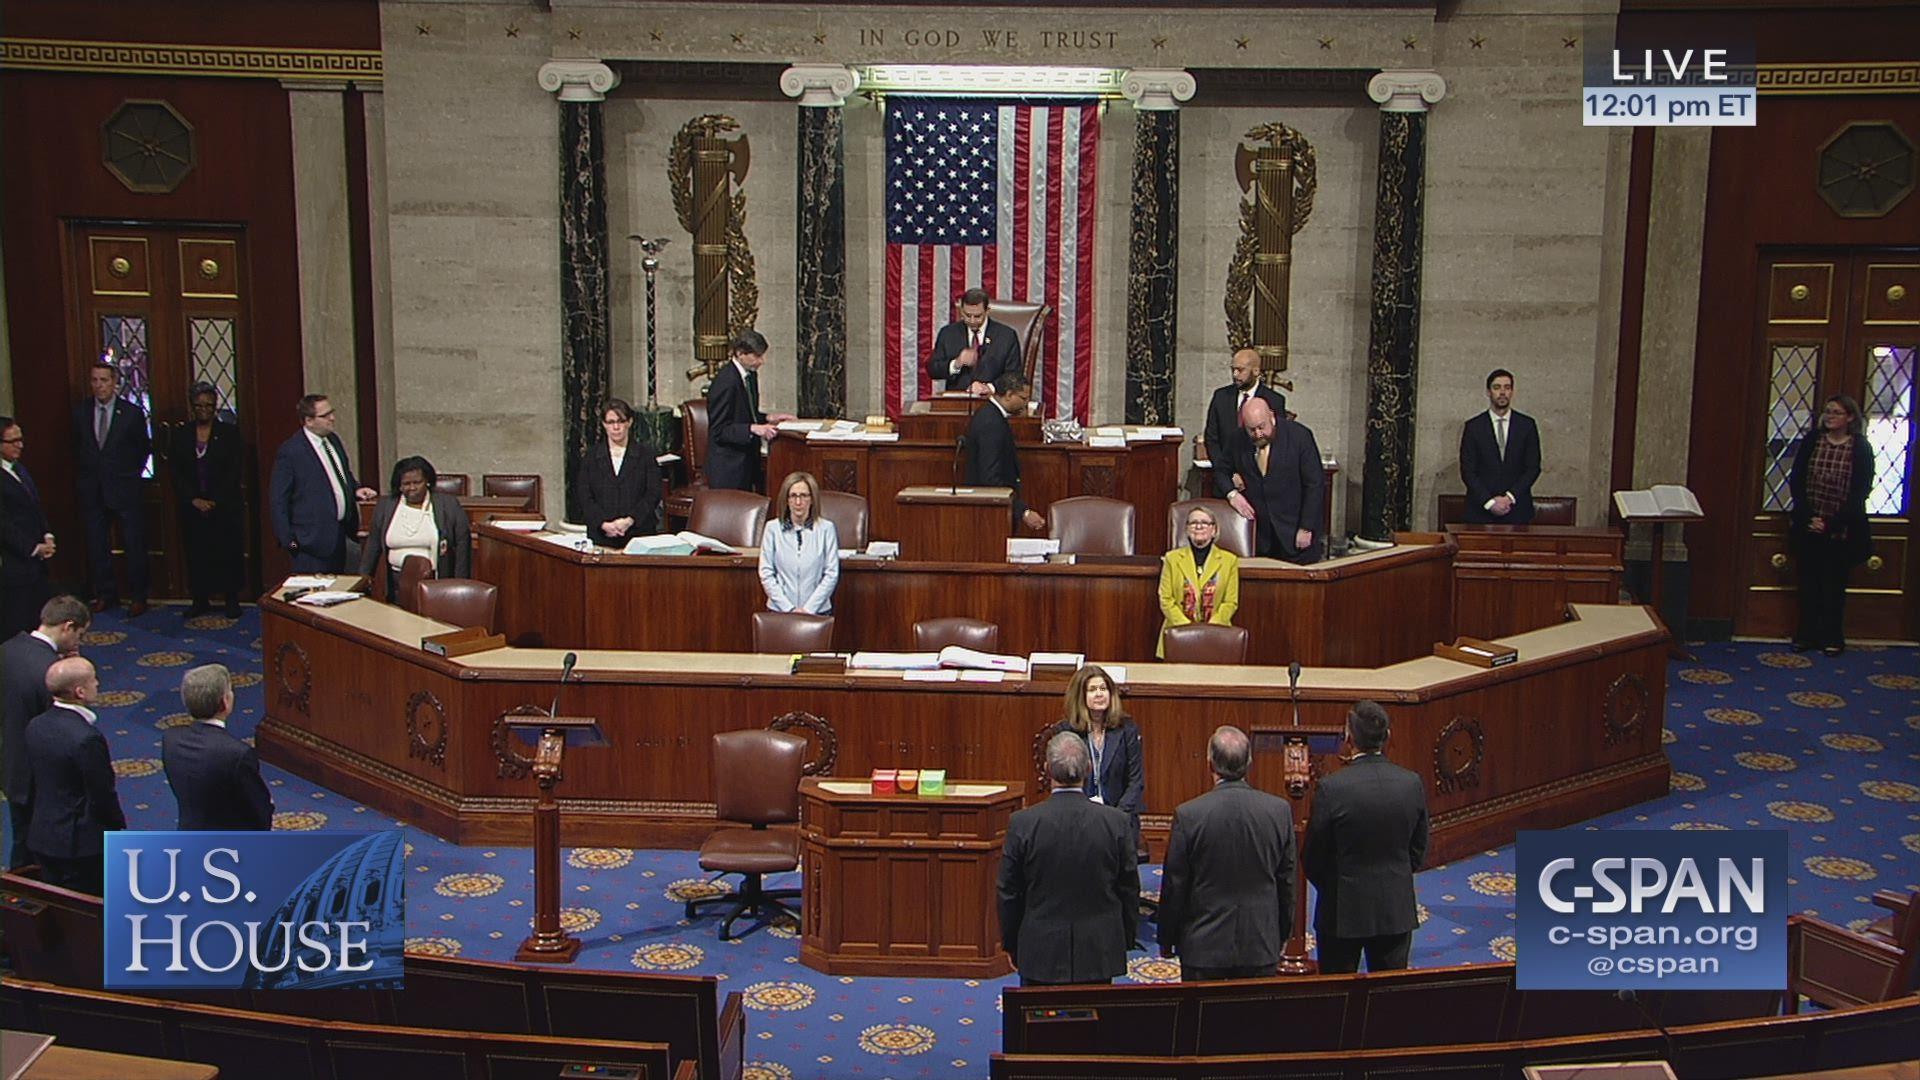 6fae54438 Watch: U.S. House Debates Resolution Blocking National Emergency Declaration